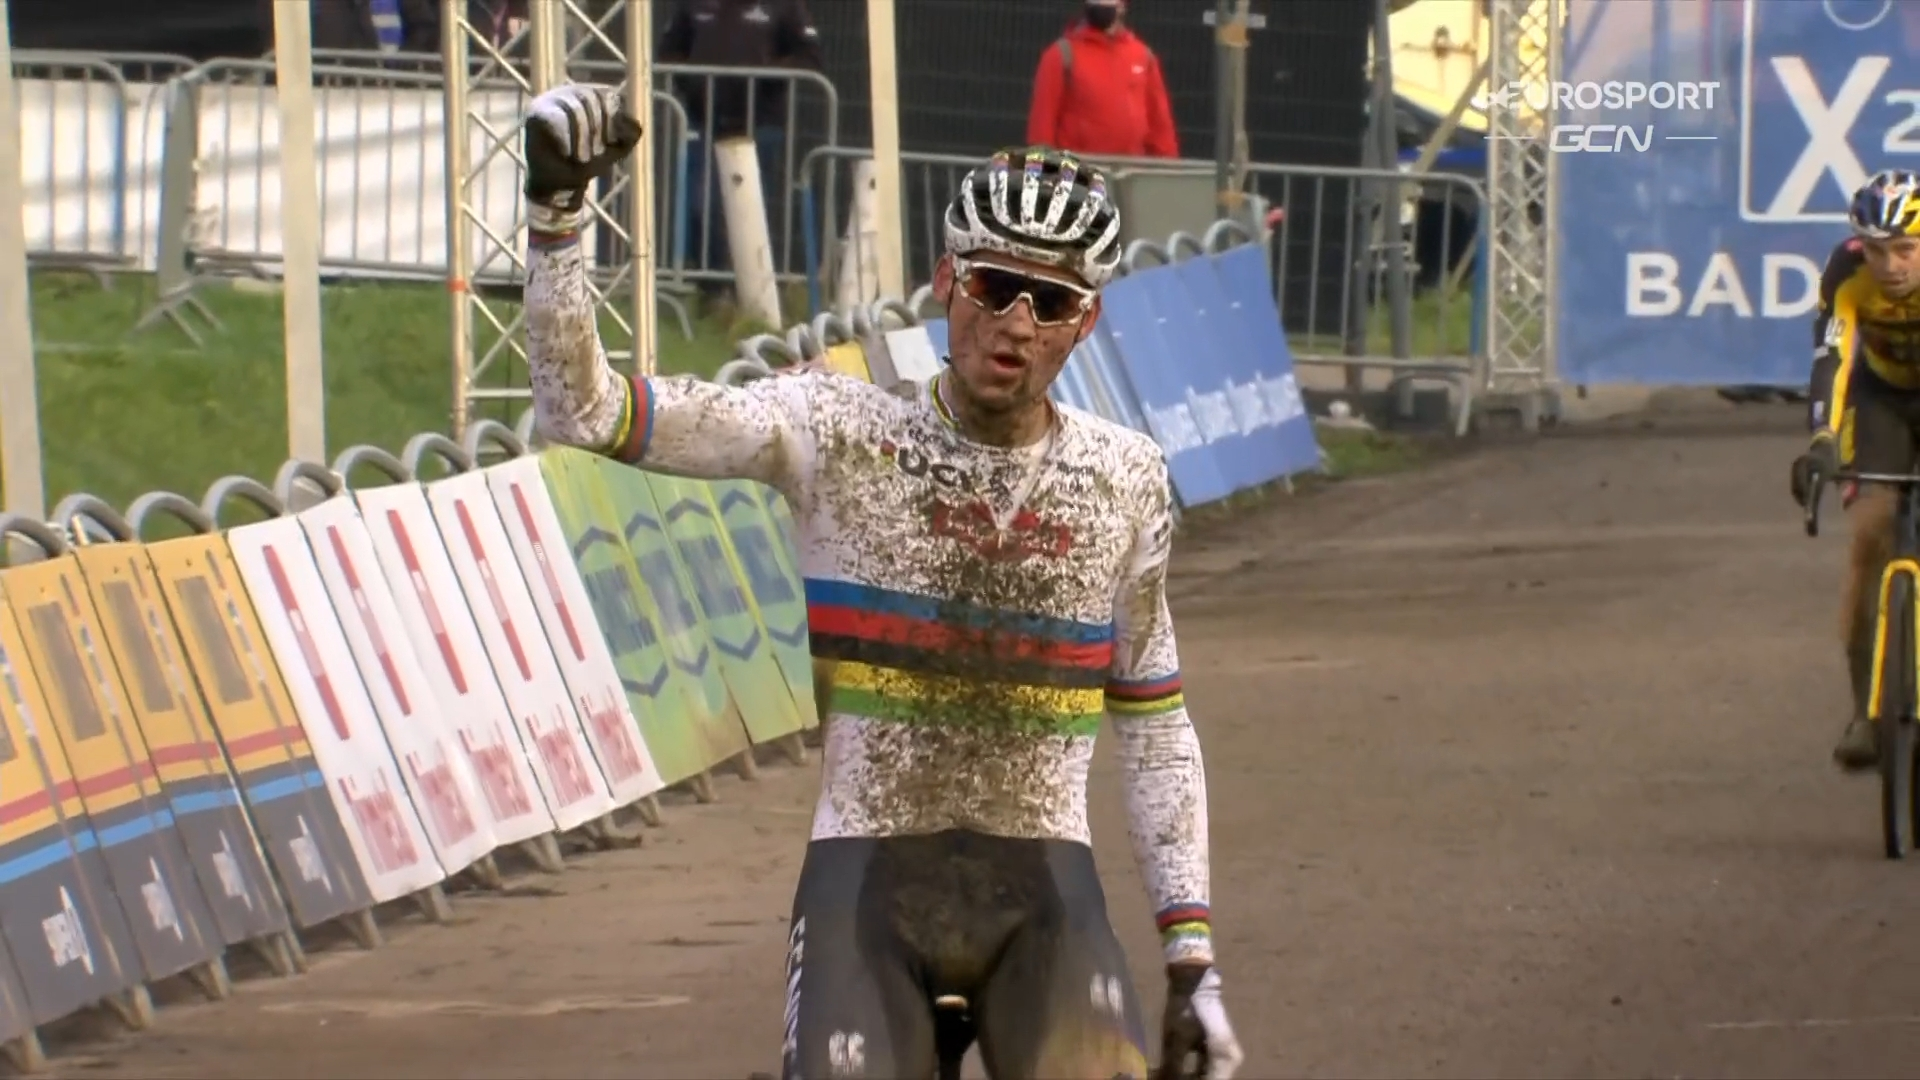 Zacięta rywalizacja na GP Sven Nys w Baal